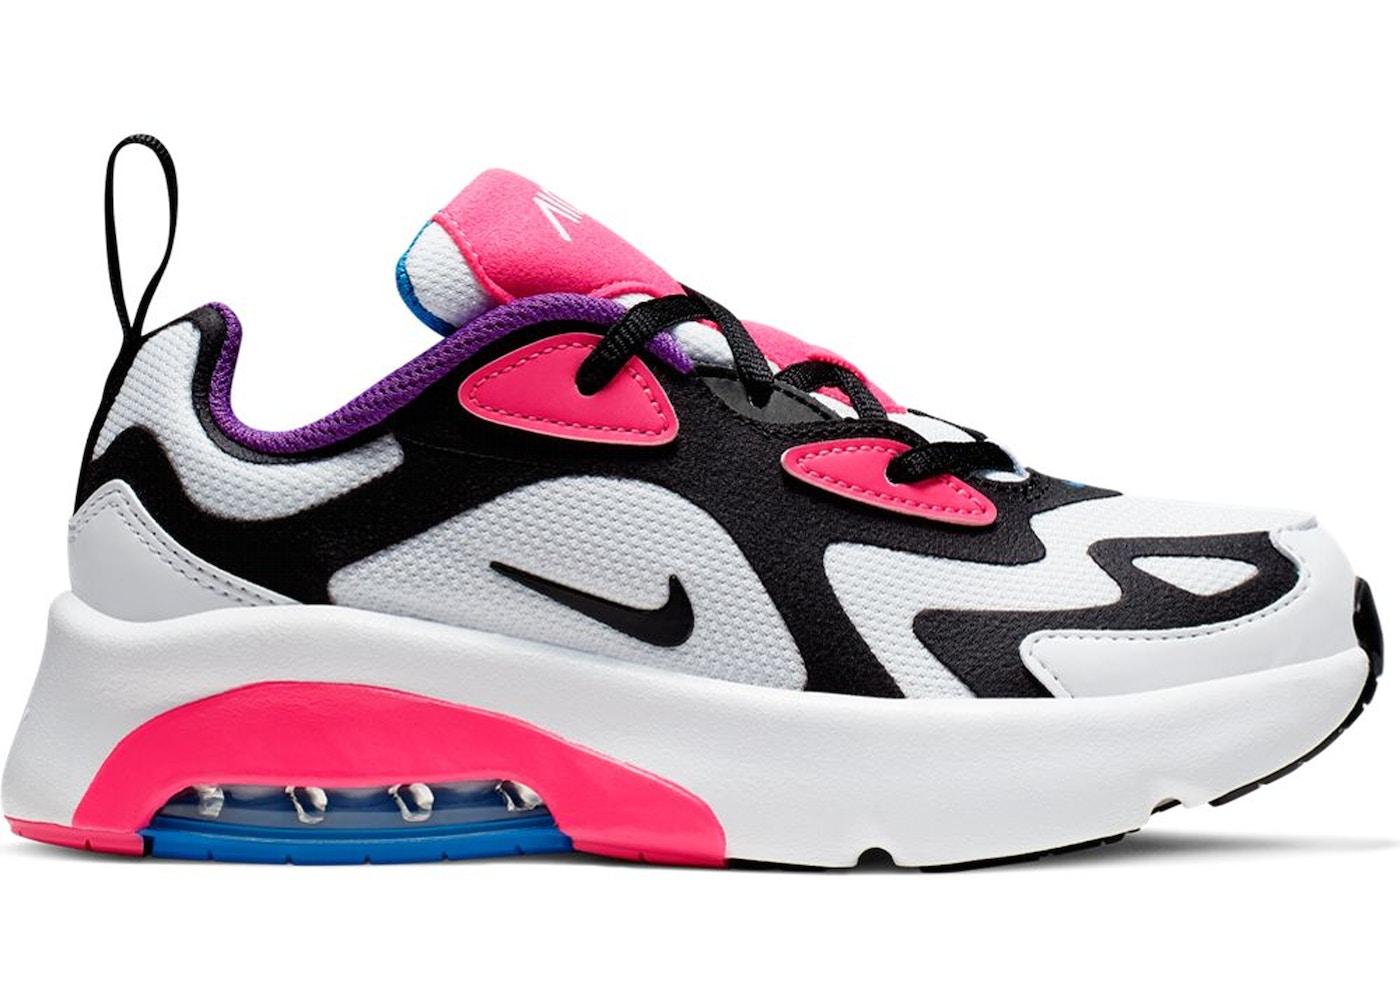 Nike Air Max 200 White Hyper Pink Black (PS)